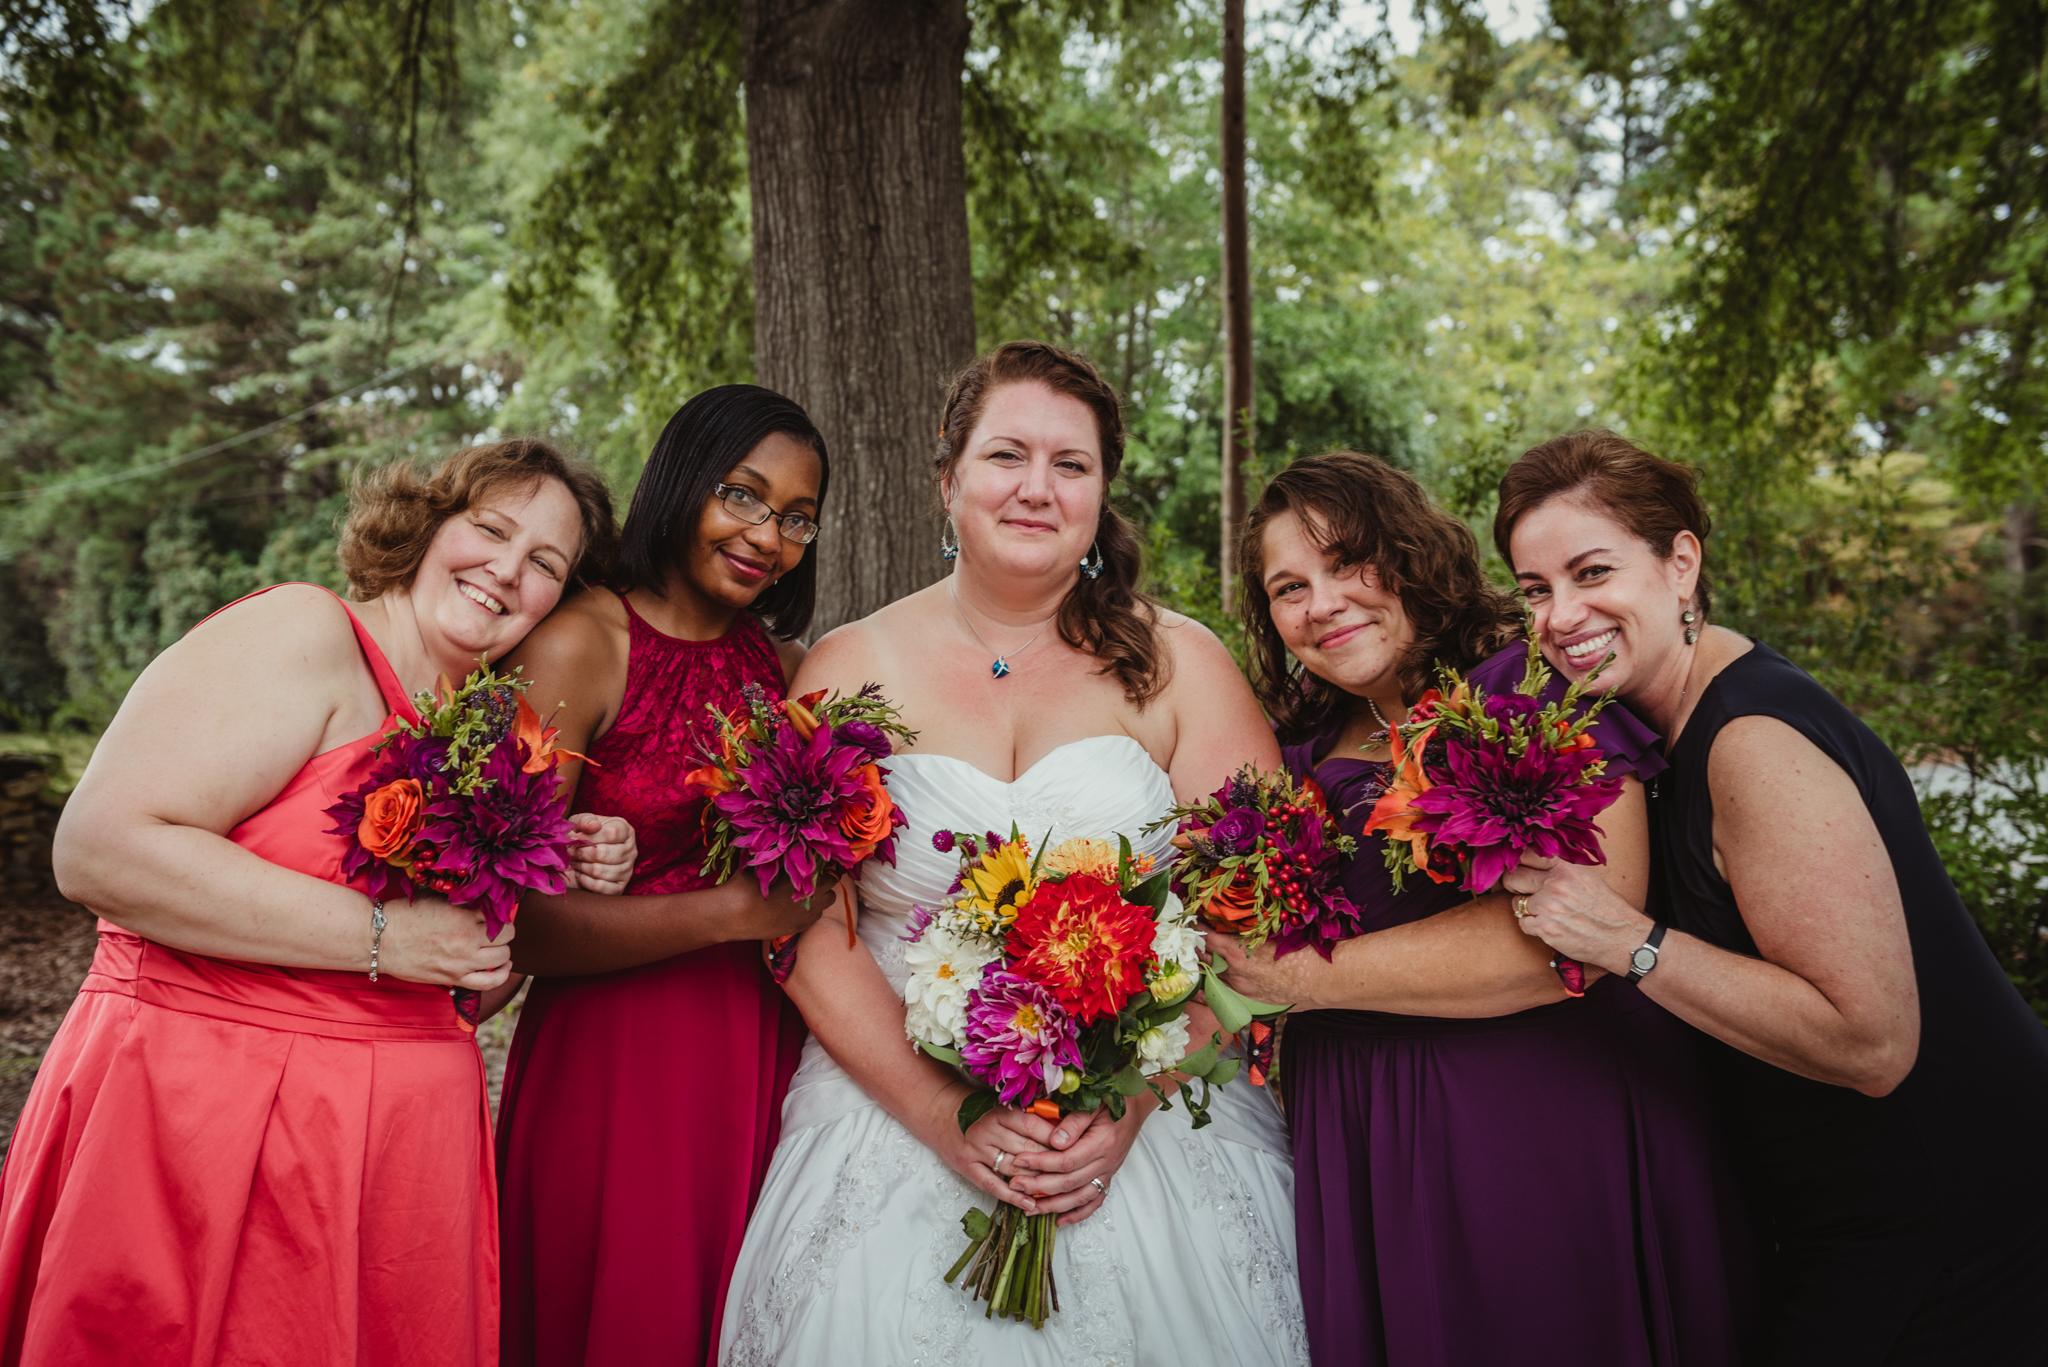 raleigh-wedding-bridesmaid-portraits-cd-2.jpg